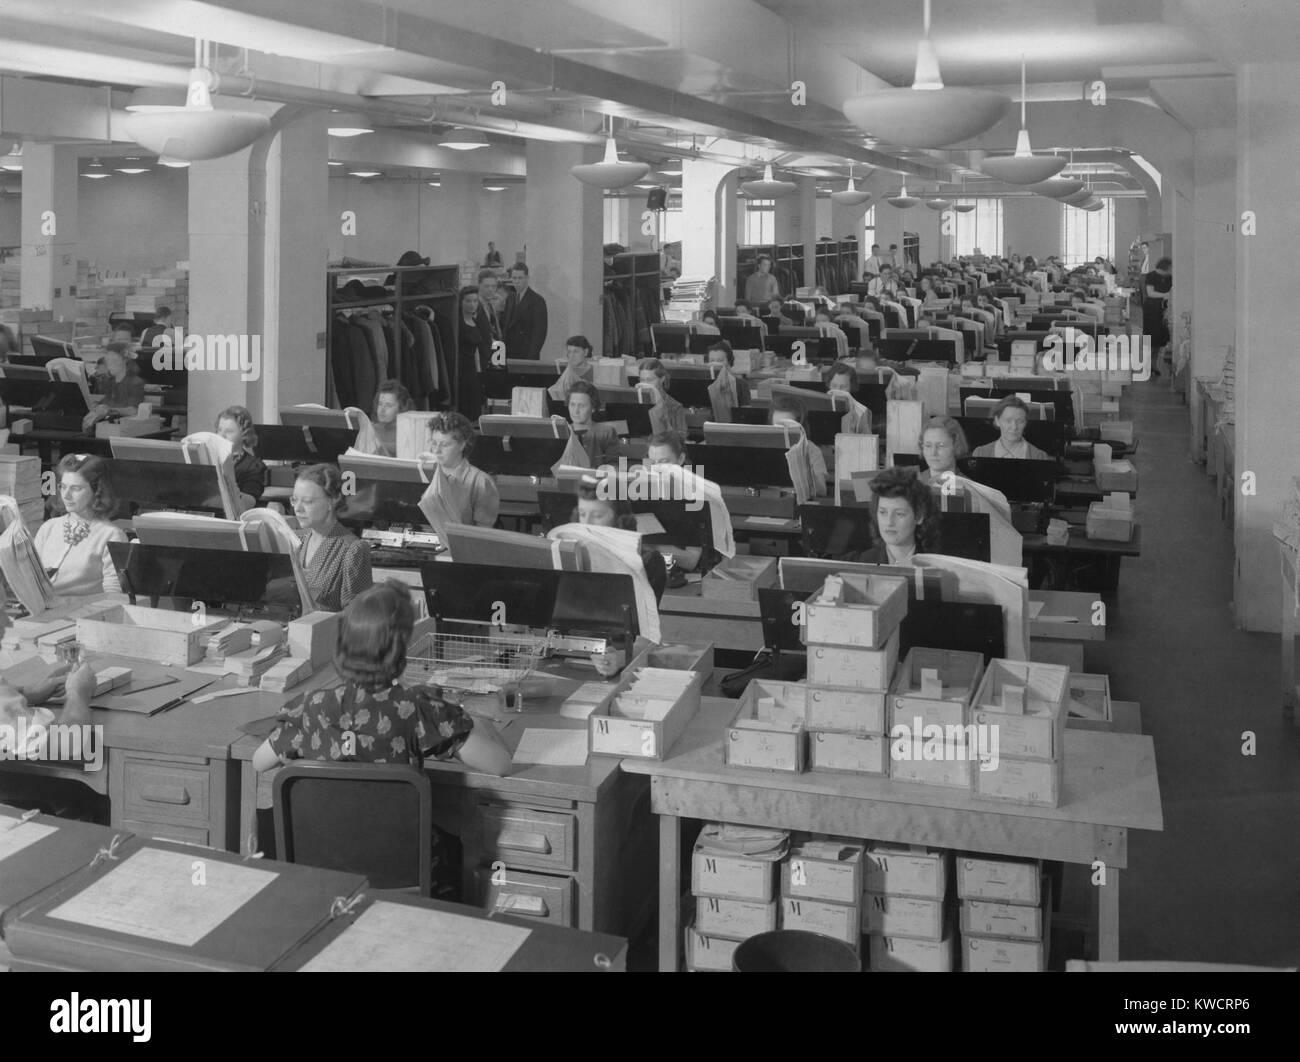 Women Working 1940s Stock Photos & Women Working 1940s Stock